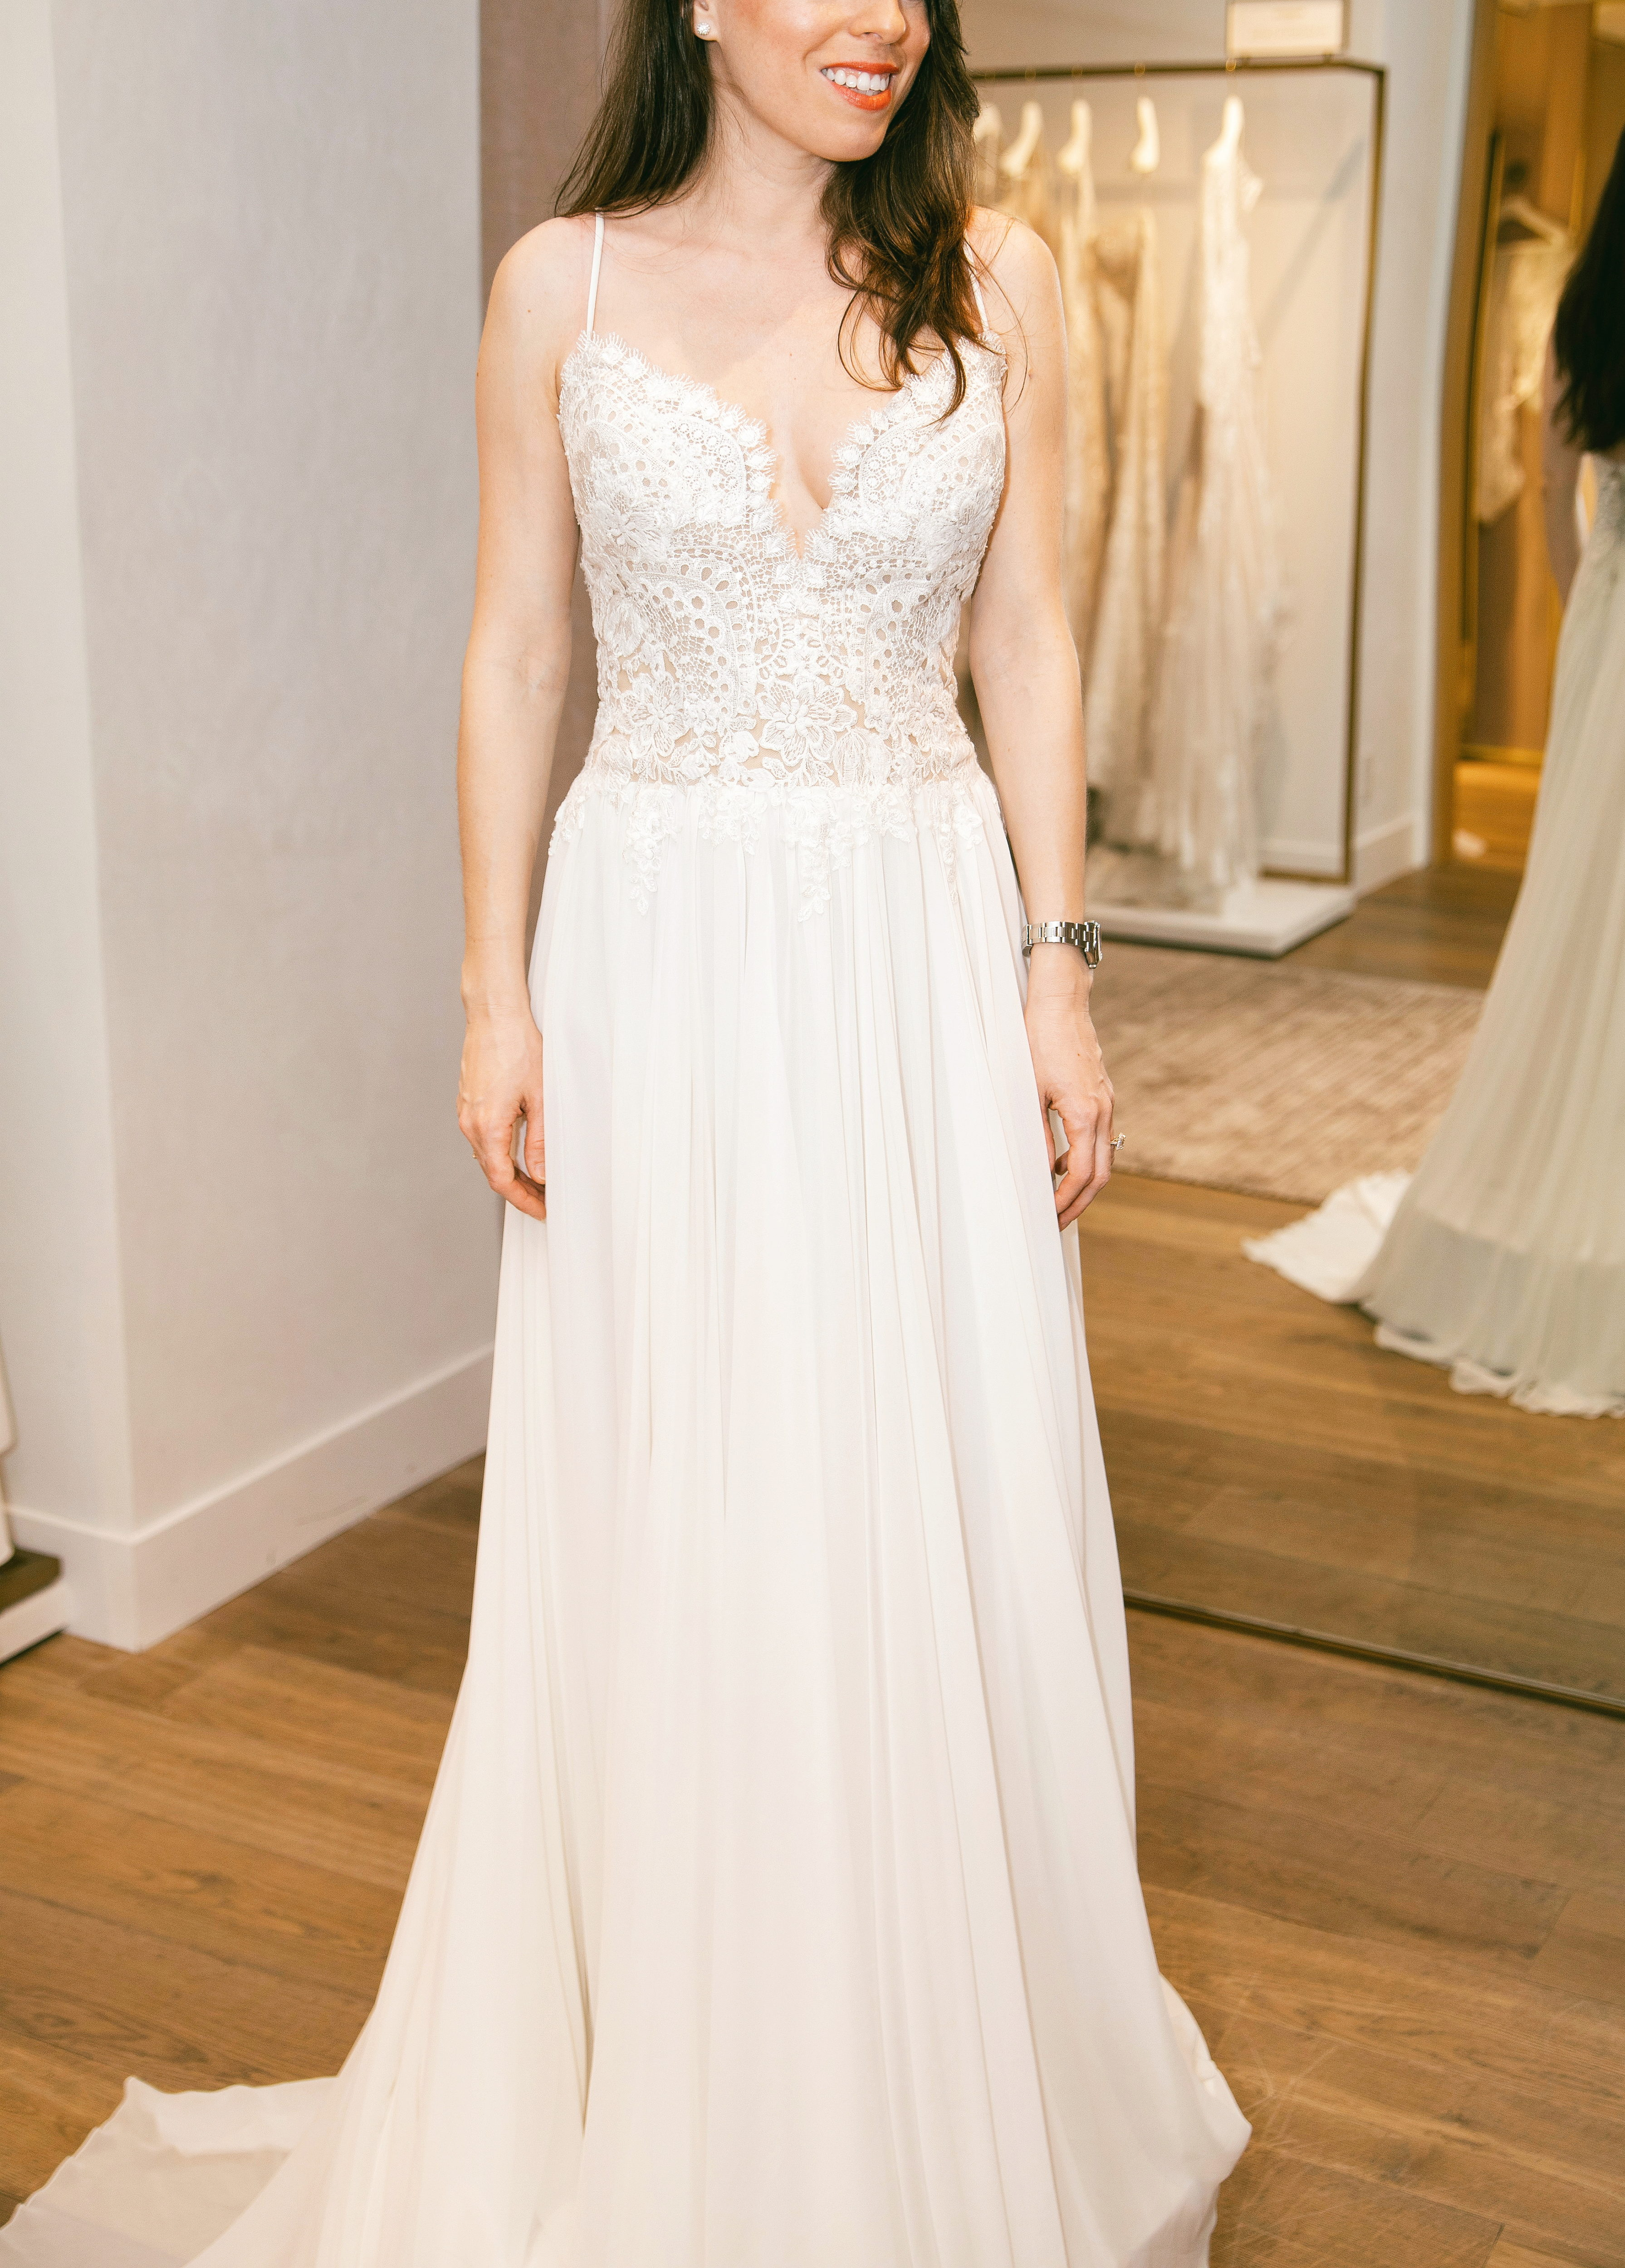 wedding-dress-try-on-pronovias-ana-florentina